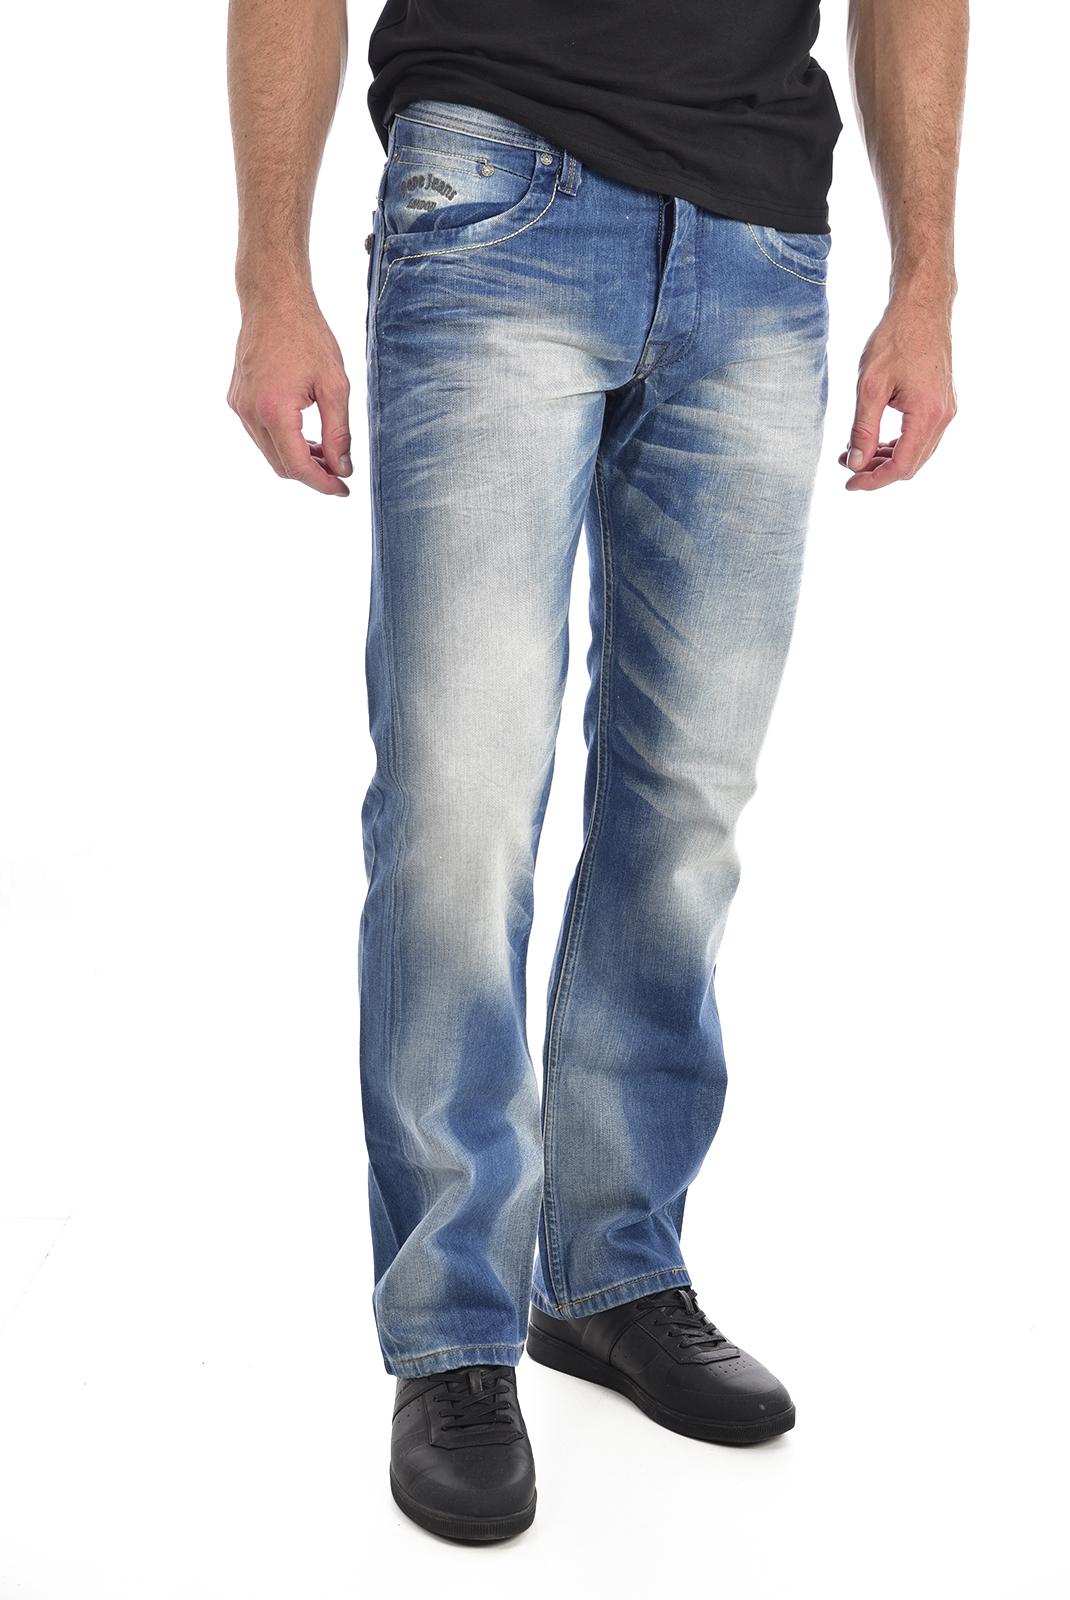 droit  Pepe jeans PM200016L172 JEANIUS bleu